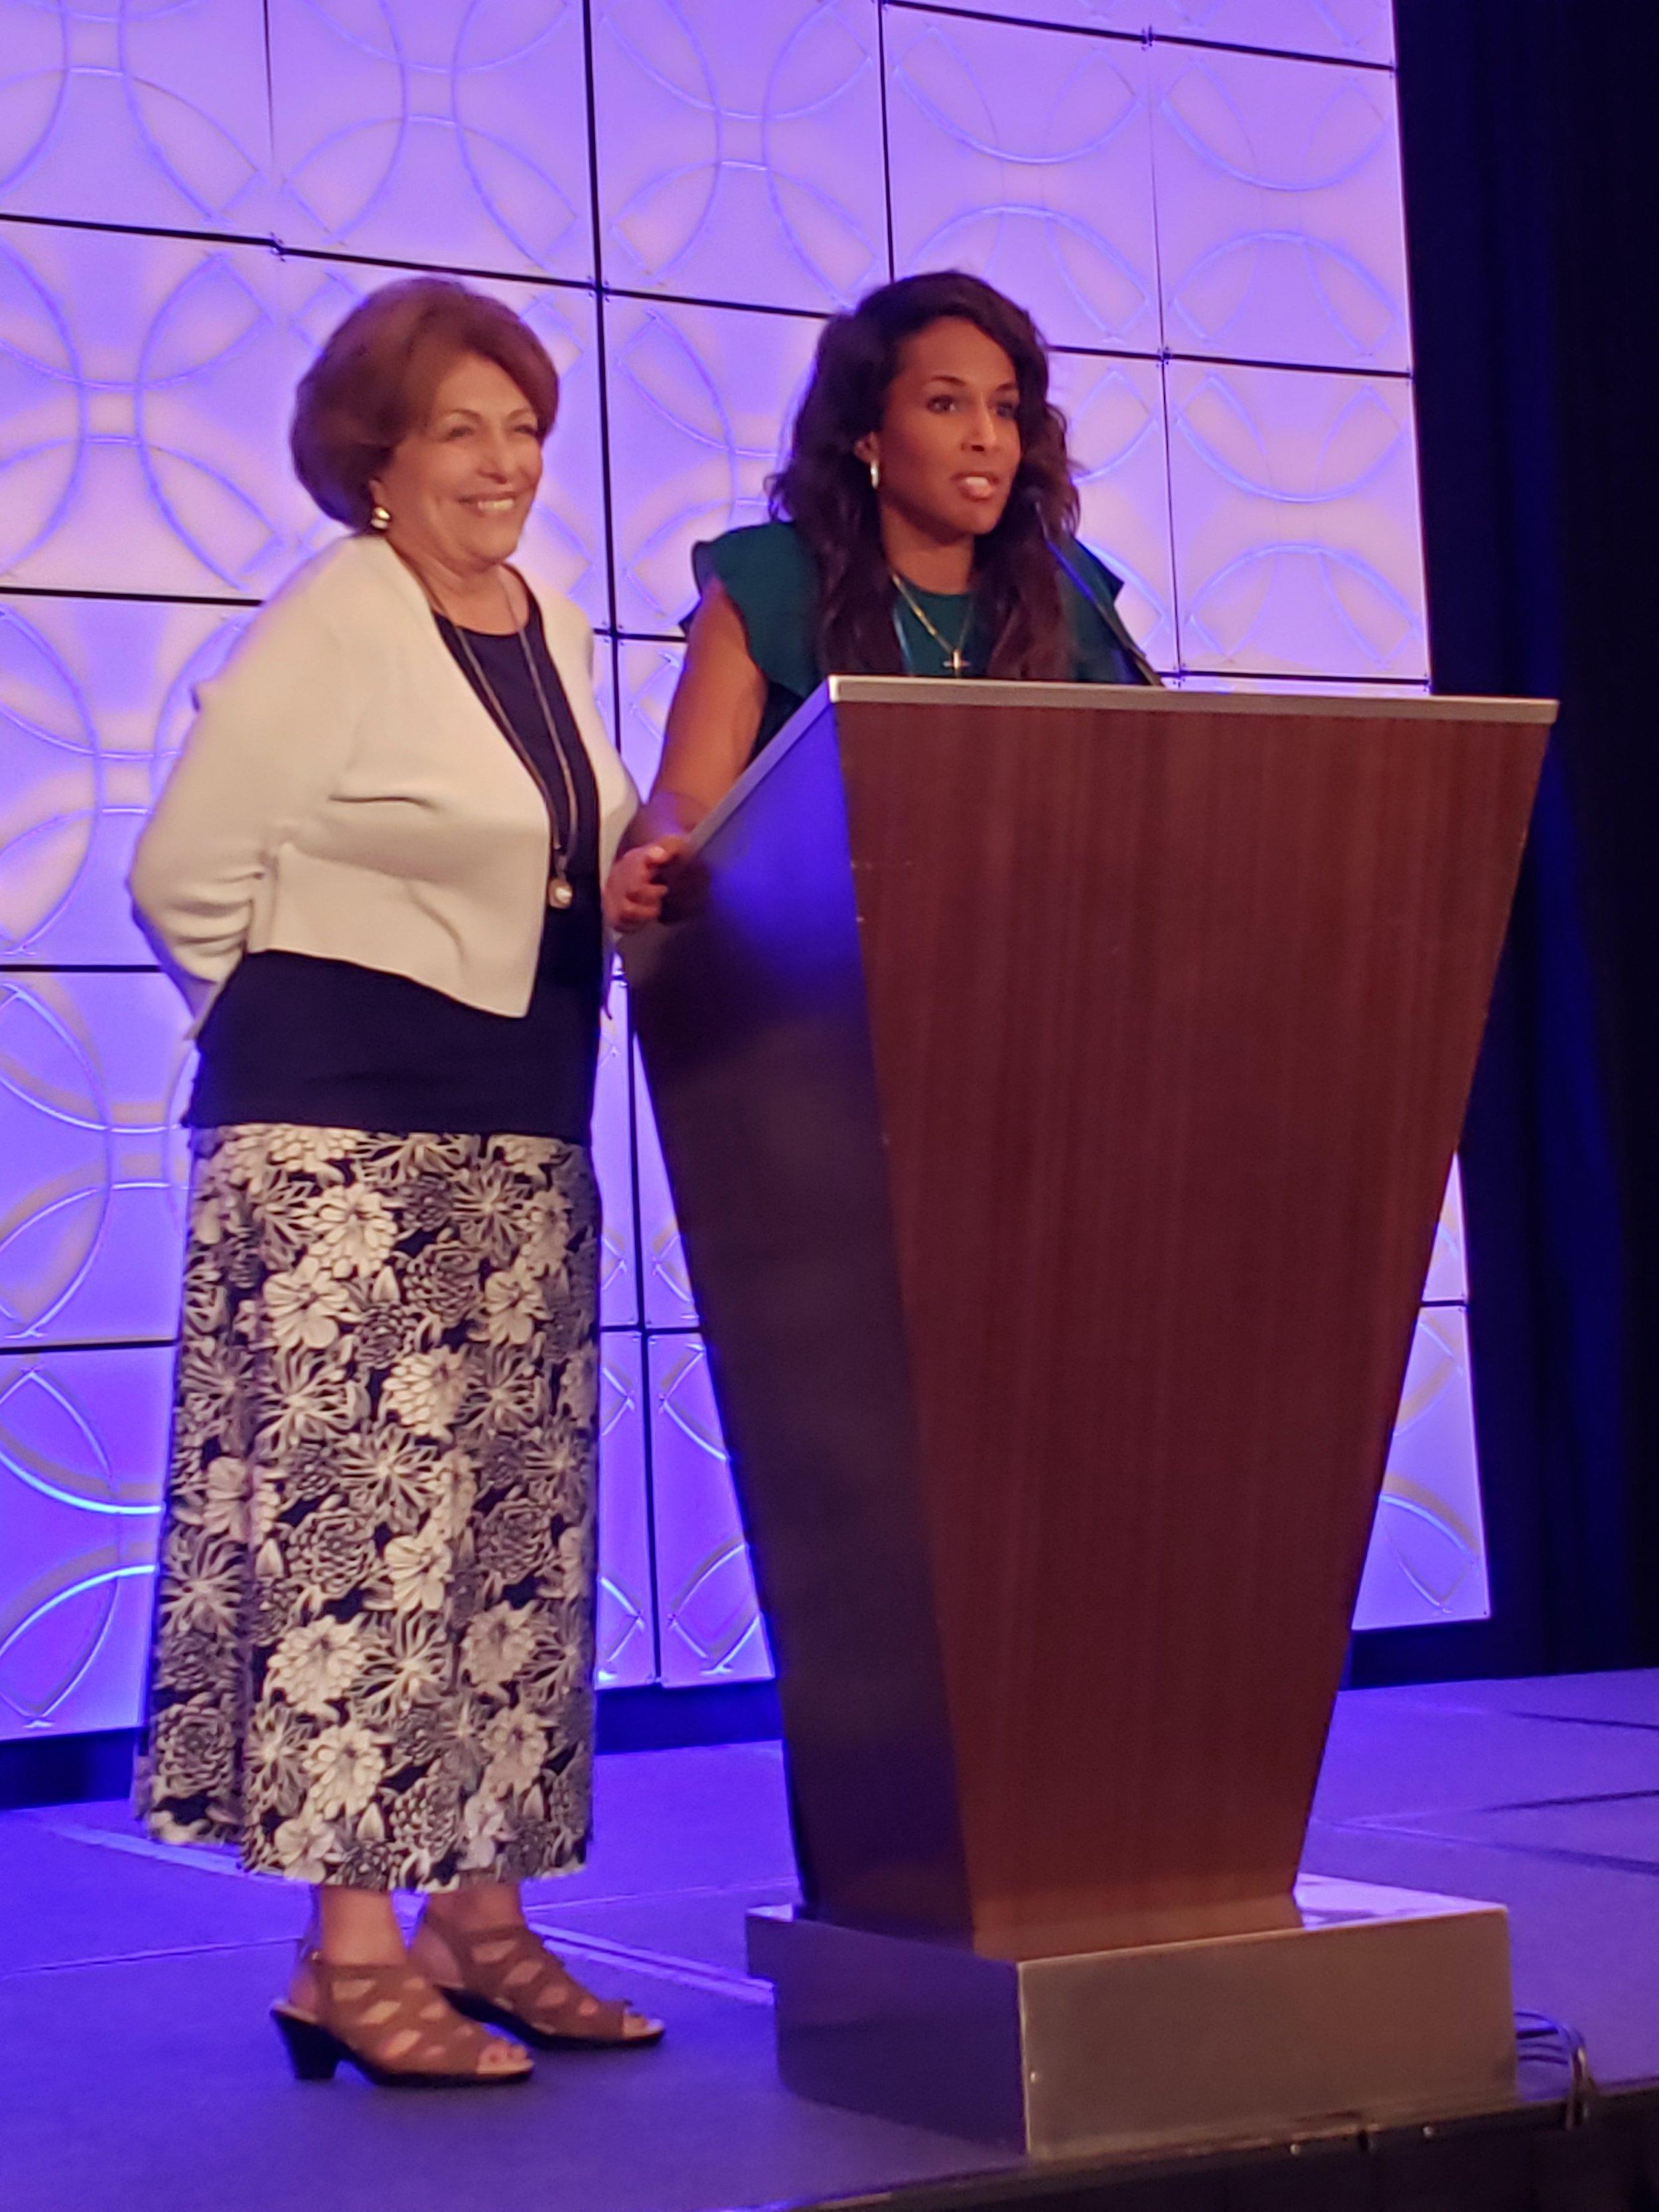 CCAE-State-Conference-San_Diego-2019-SC (4).jpg